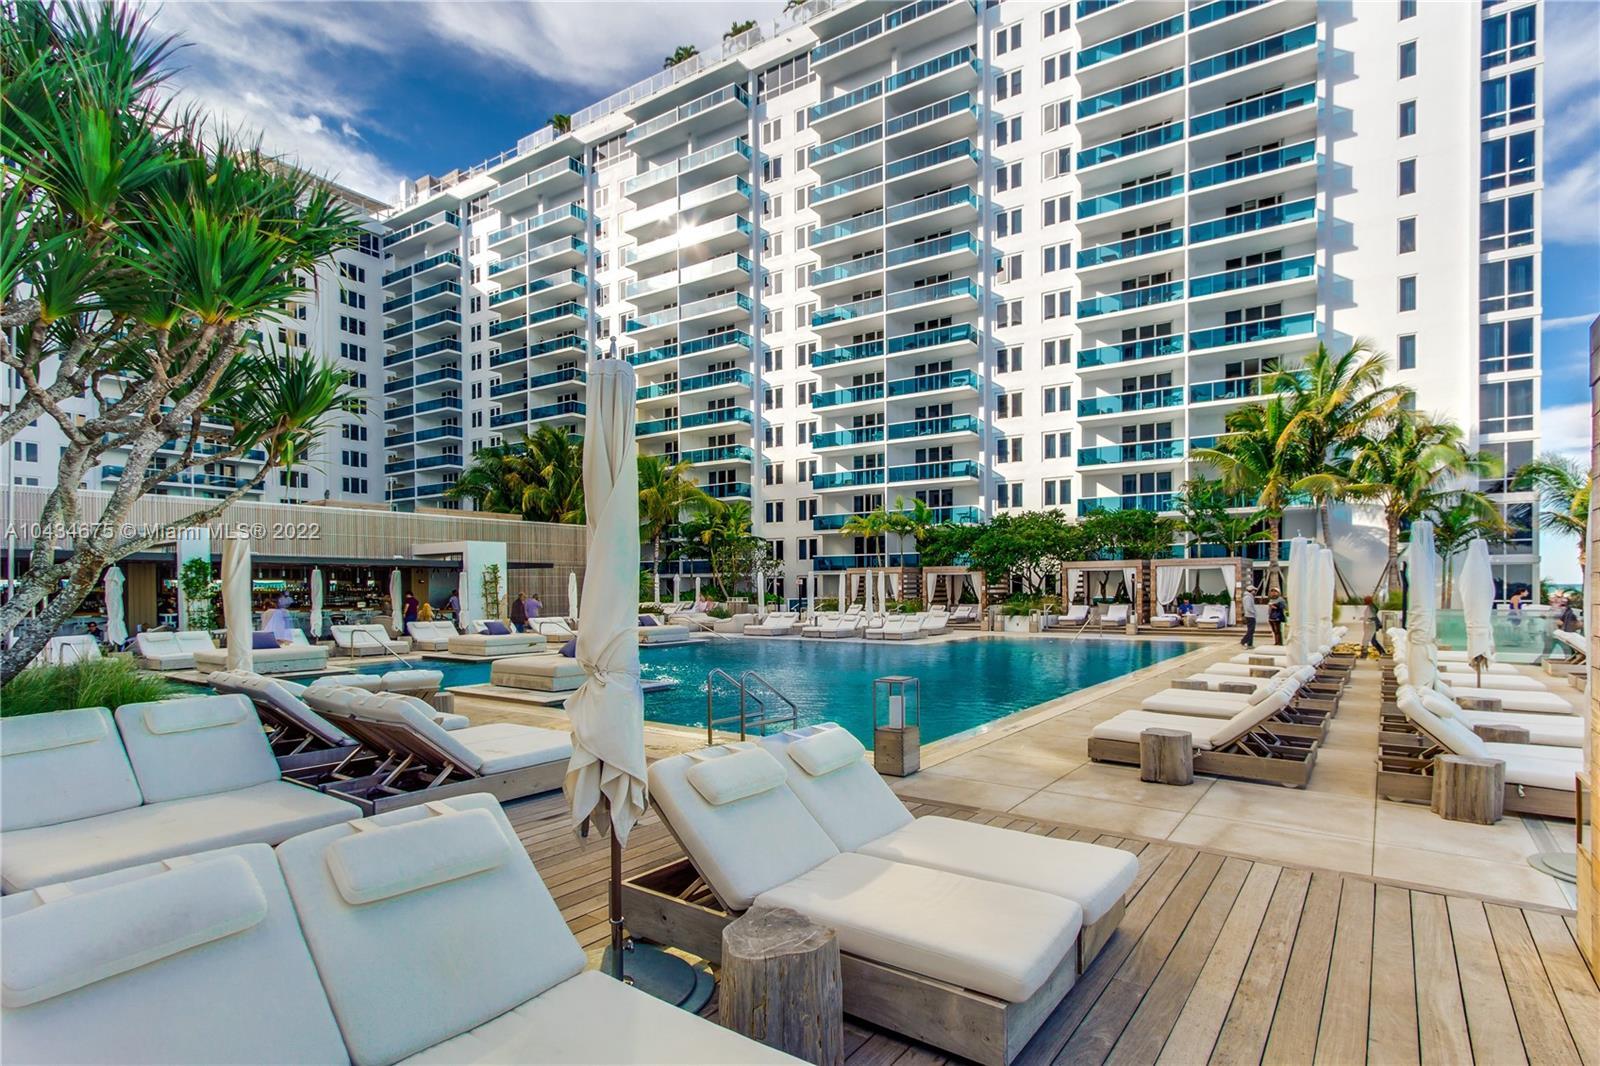 1 Hotel & Homes #1013 - 102 24th St #1013, Miami Beach, FL 33139